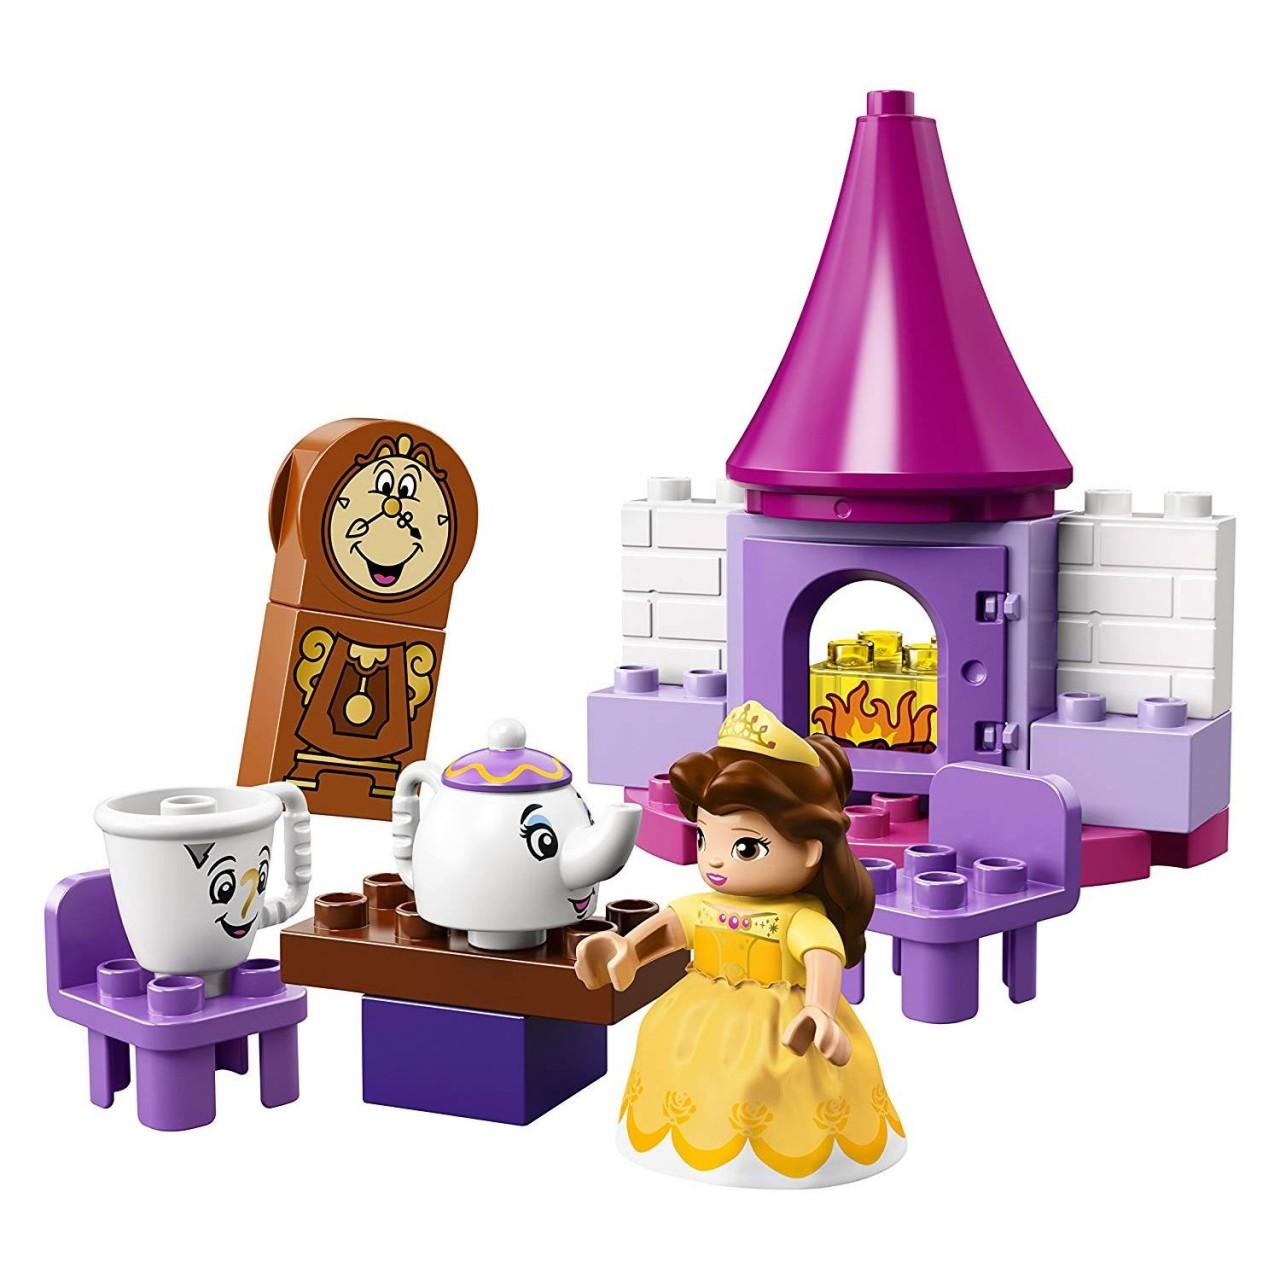 LEGO DUPLO 10877 Belle's Teeparty